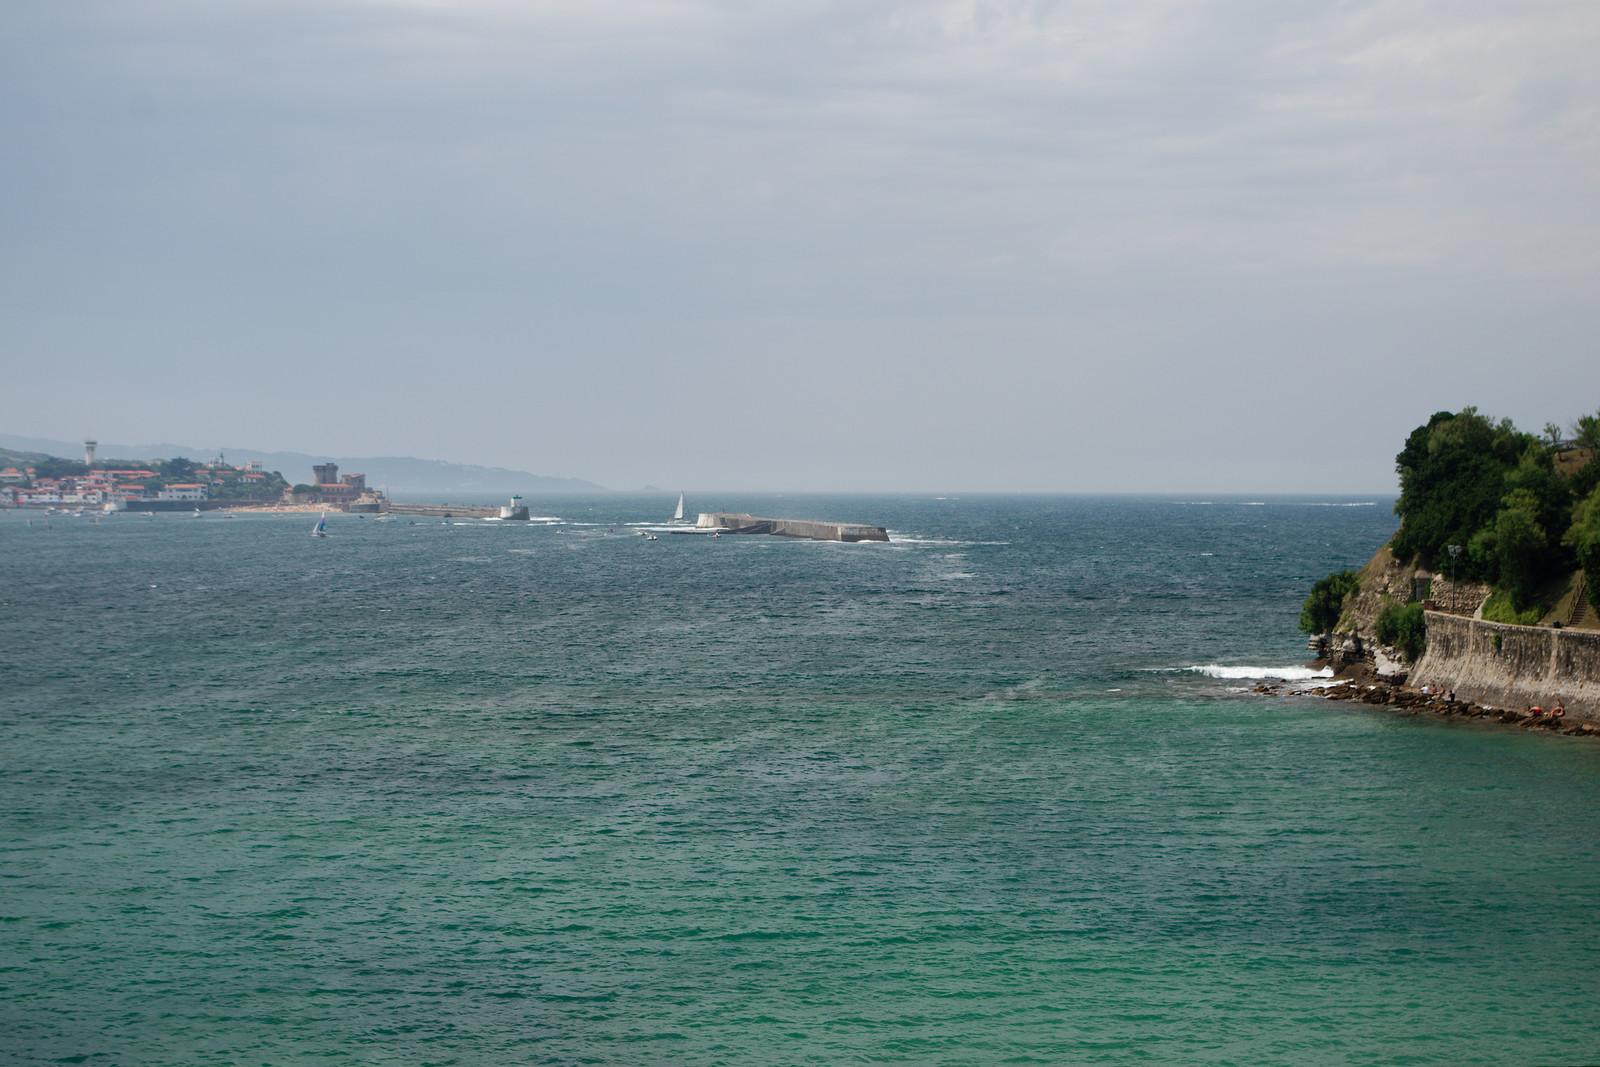 La baie de Saint-Jean-de-Luz